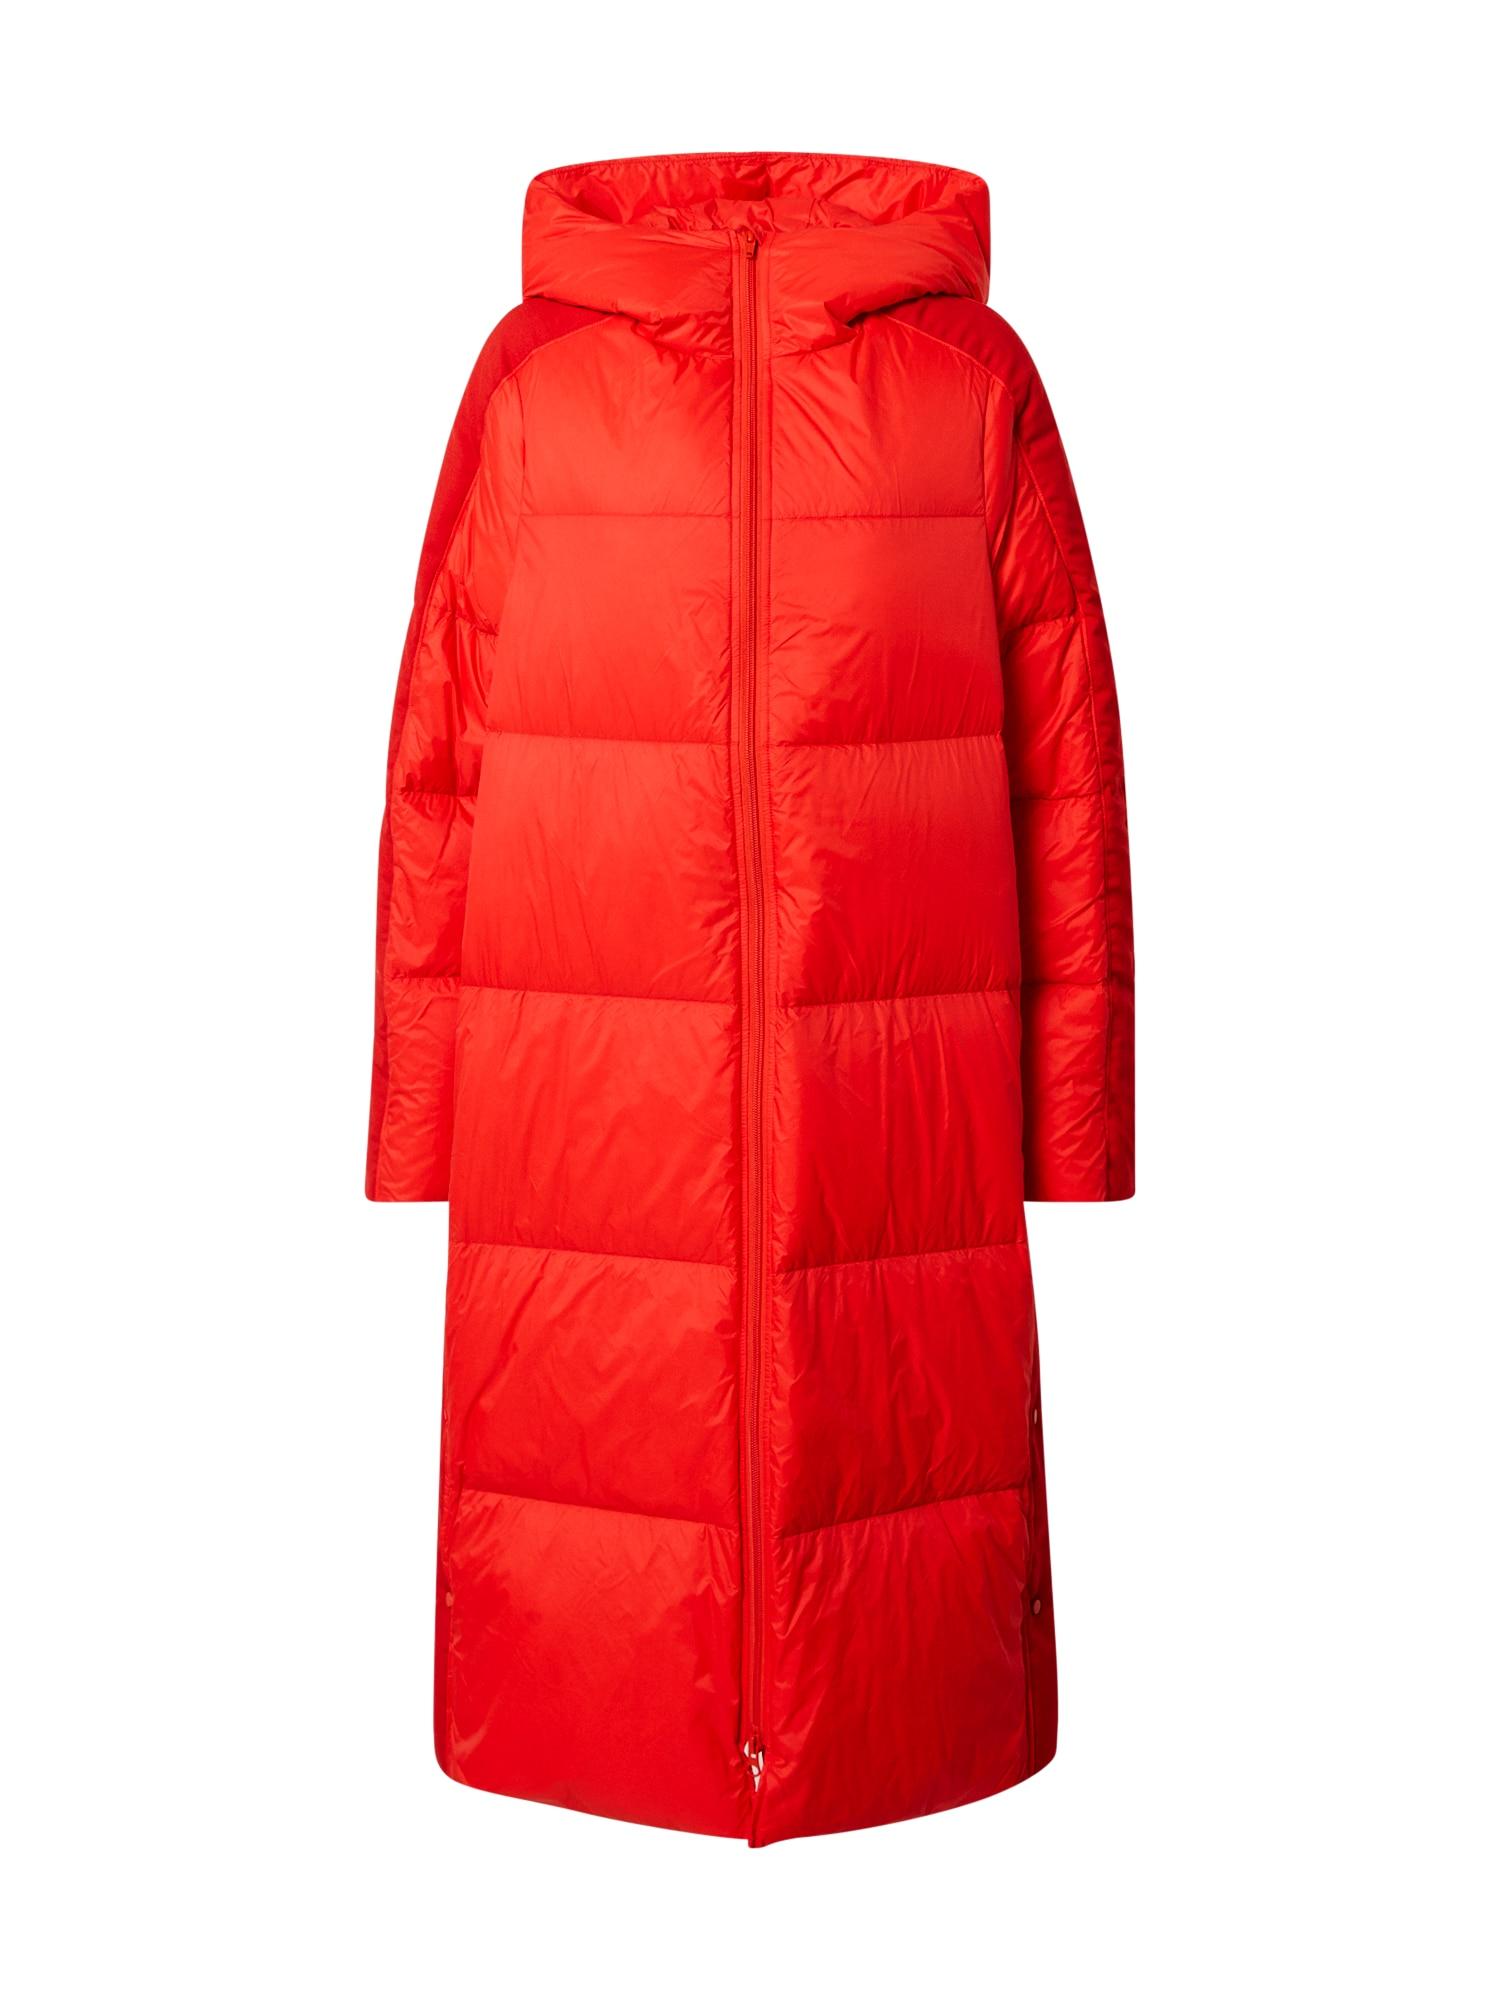 JNBY Demisezoninis paltas ugnies raudona